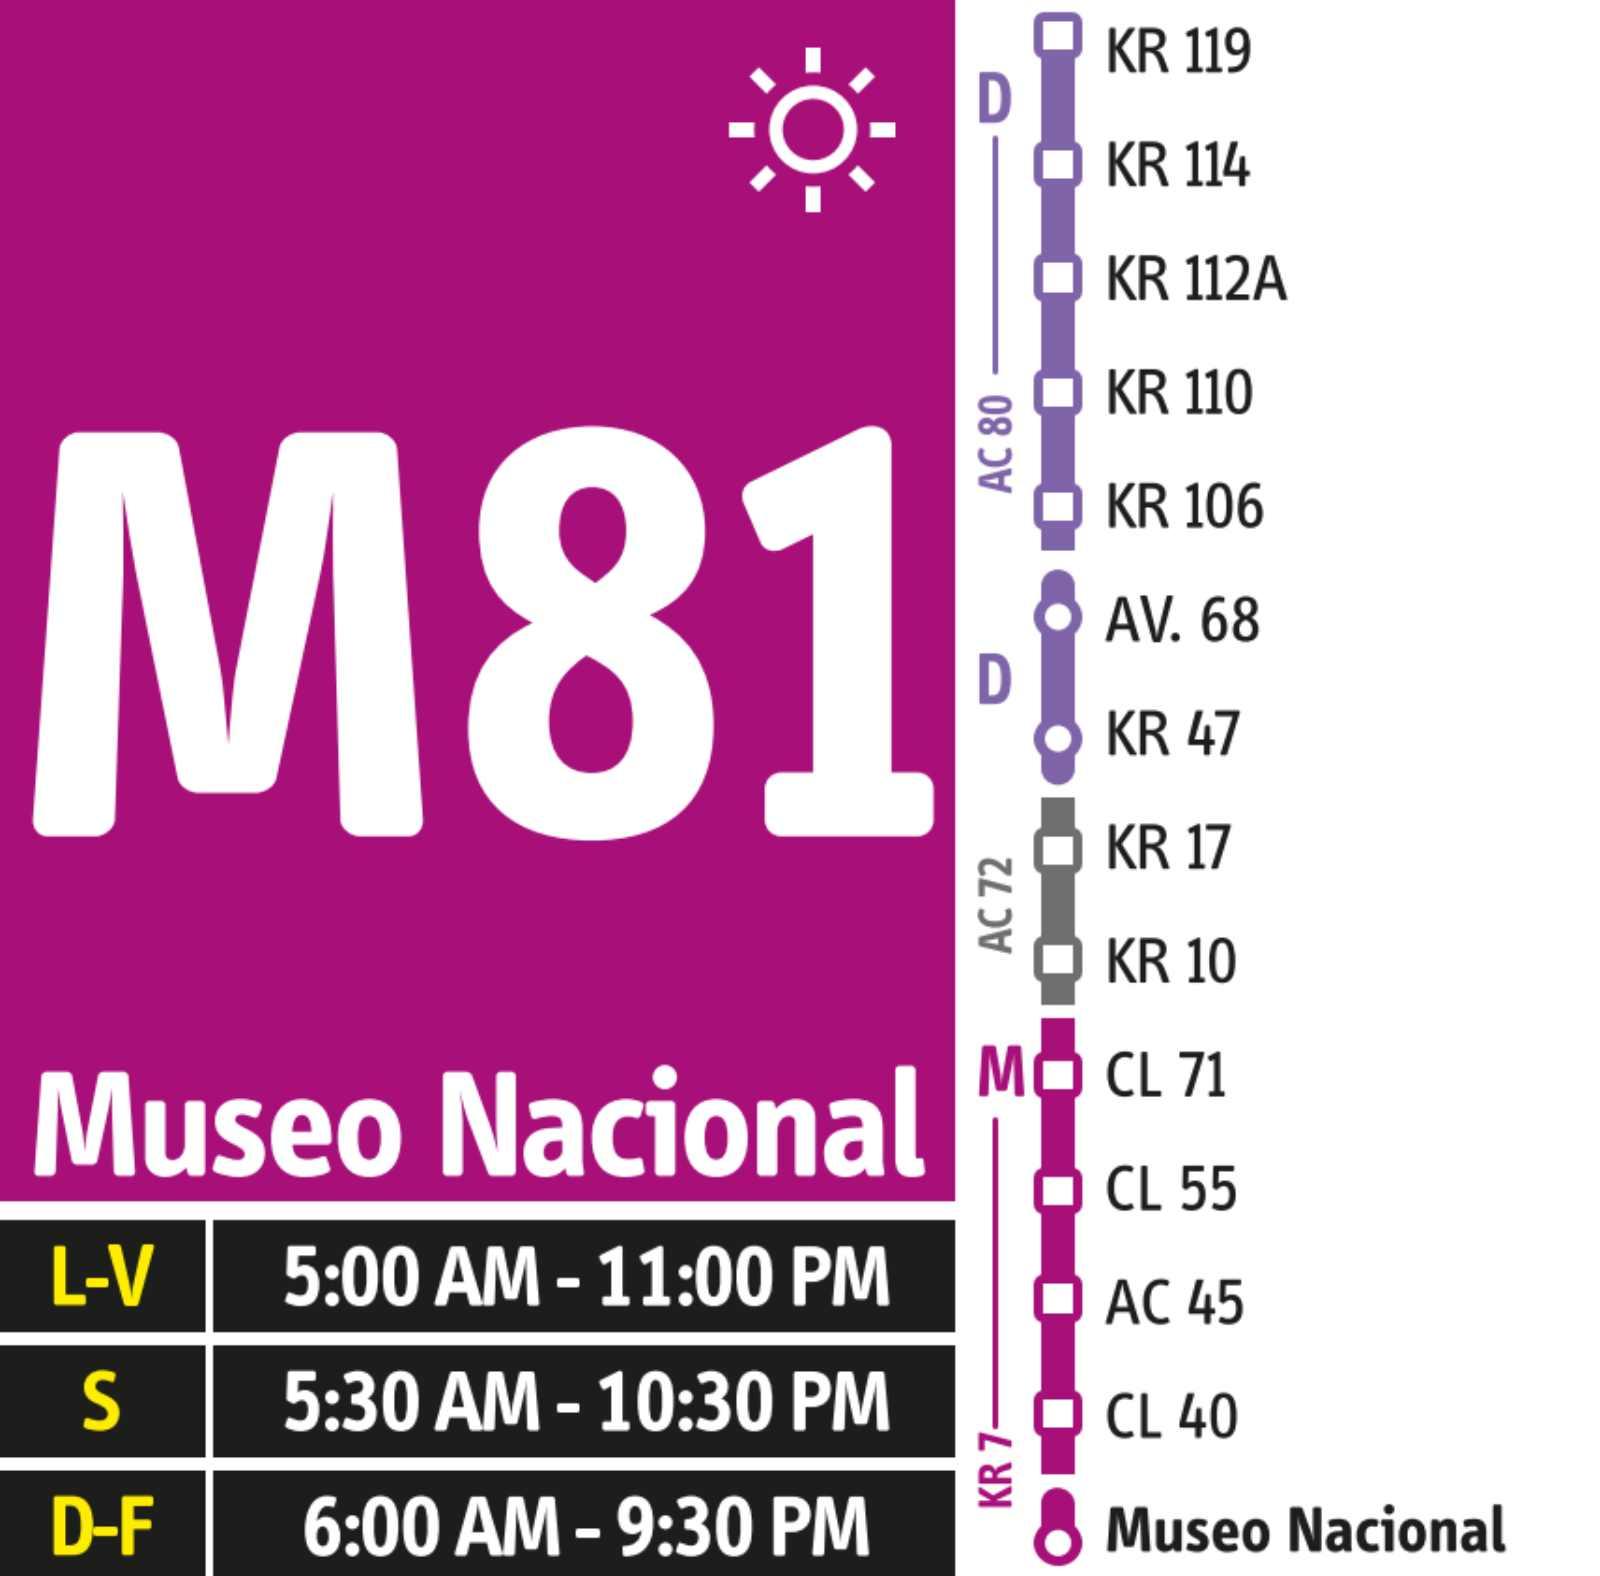 M81-D81 > Calle 80 Puente de Guadua- Museo Nacional